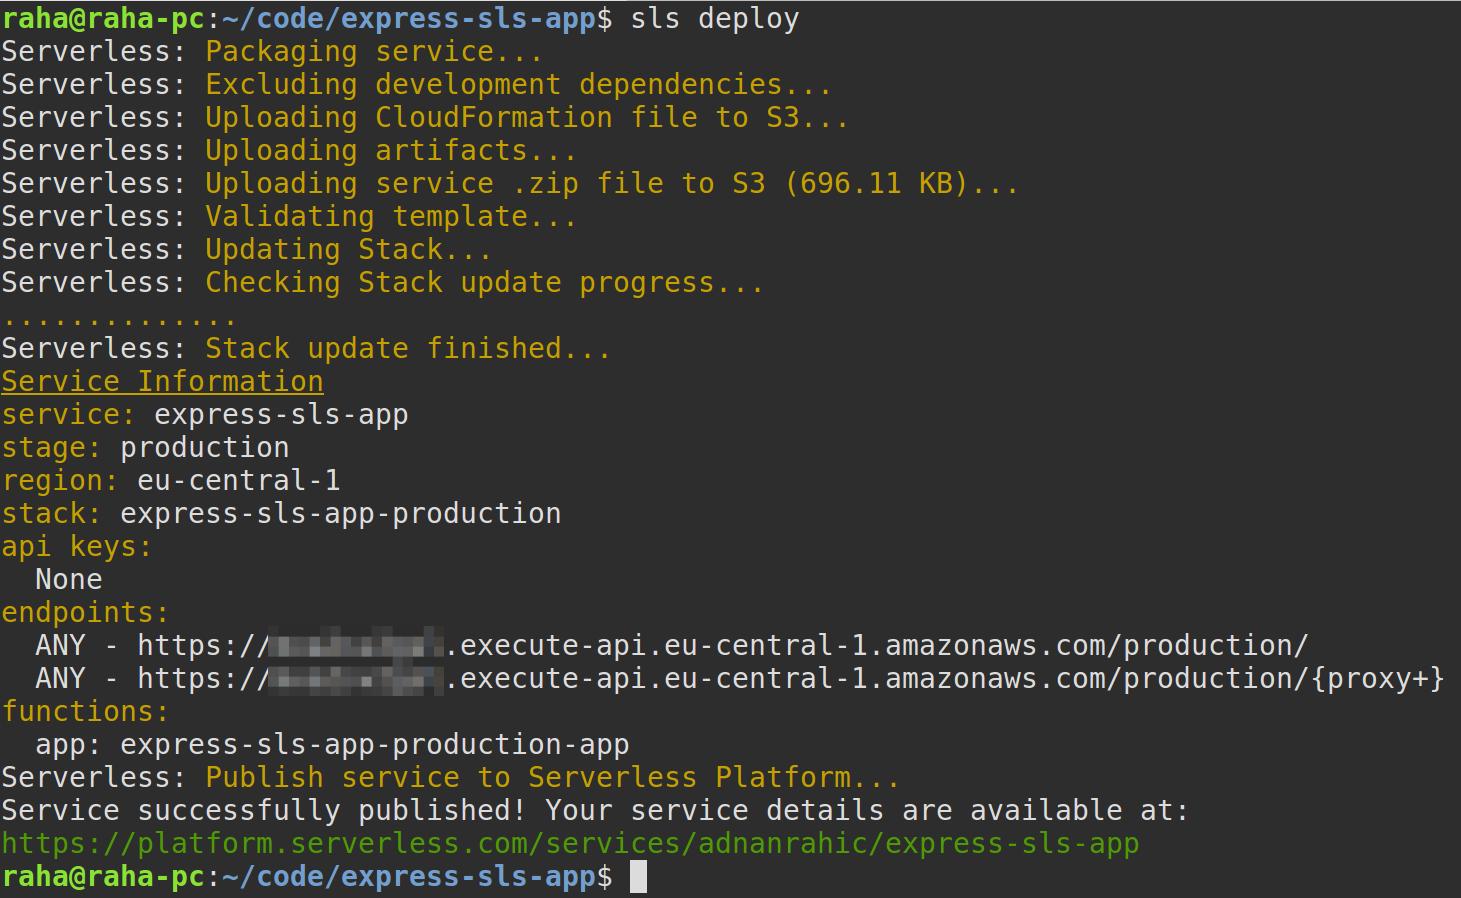 terminal show sls deploy output